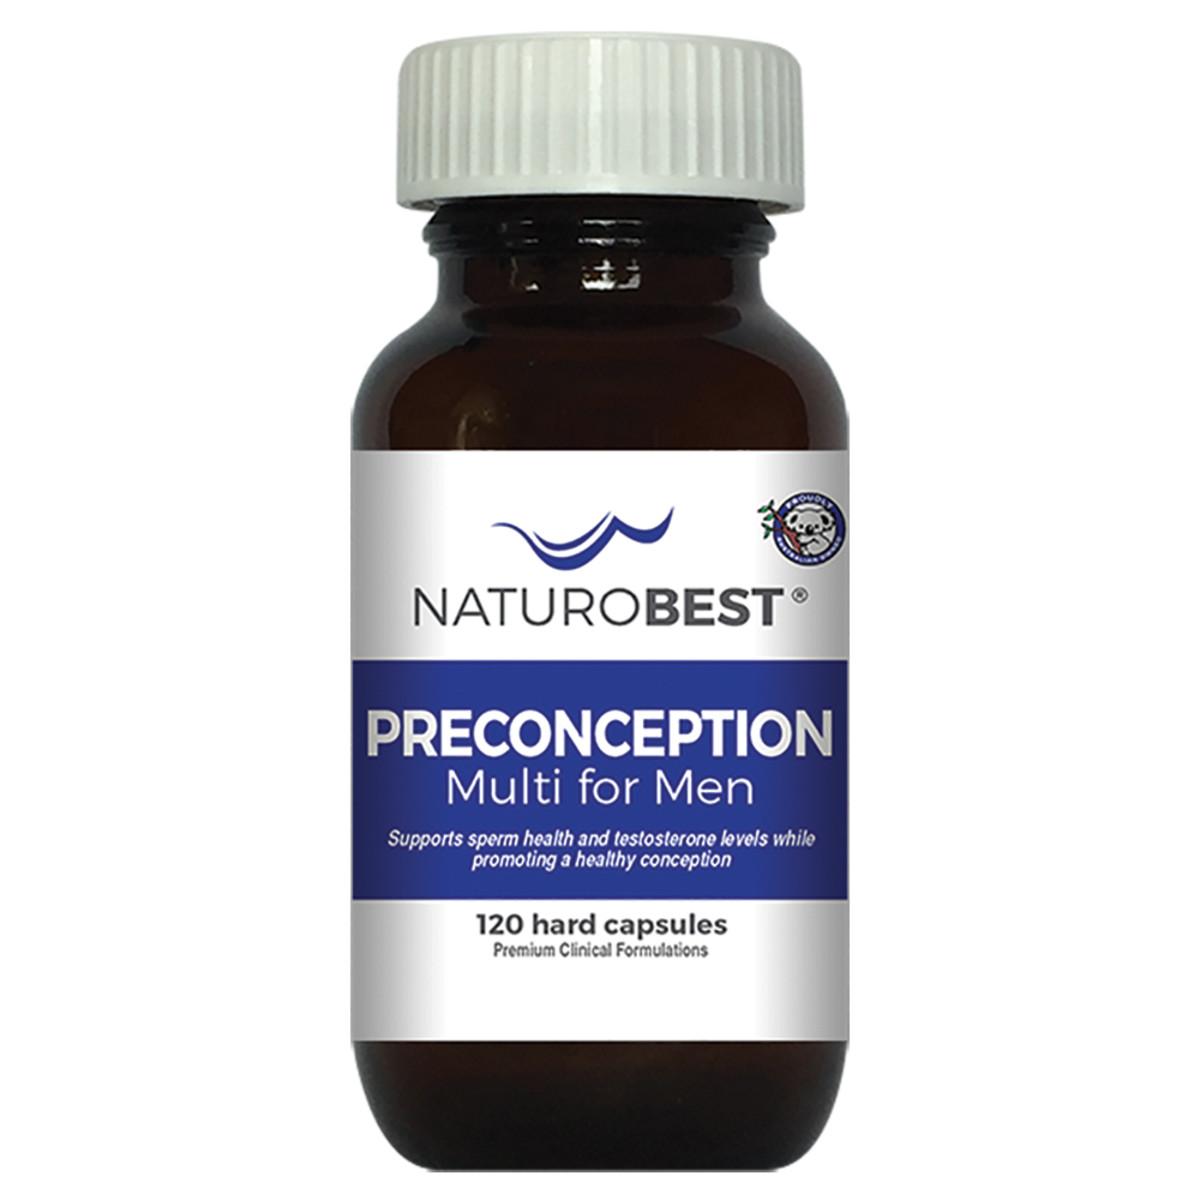 NaturoBest Preconception Multi for Men 120c_media-01